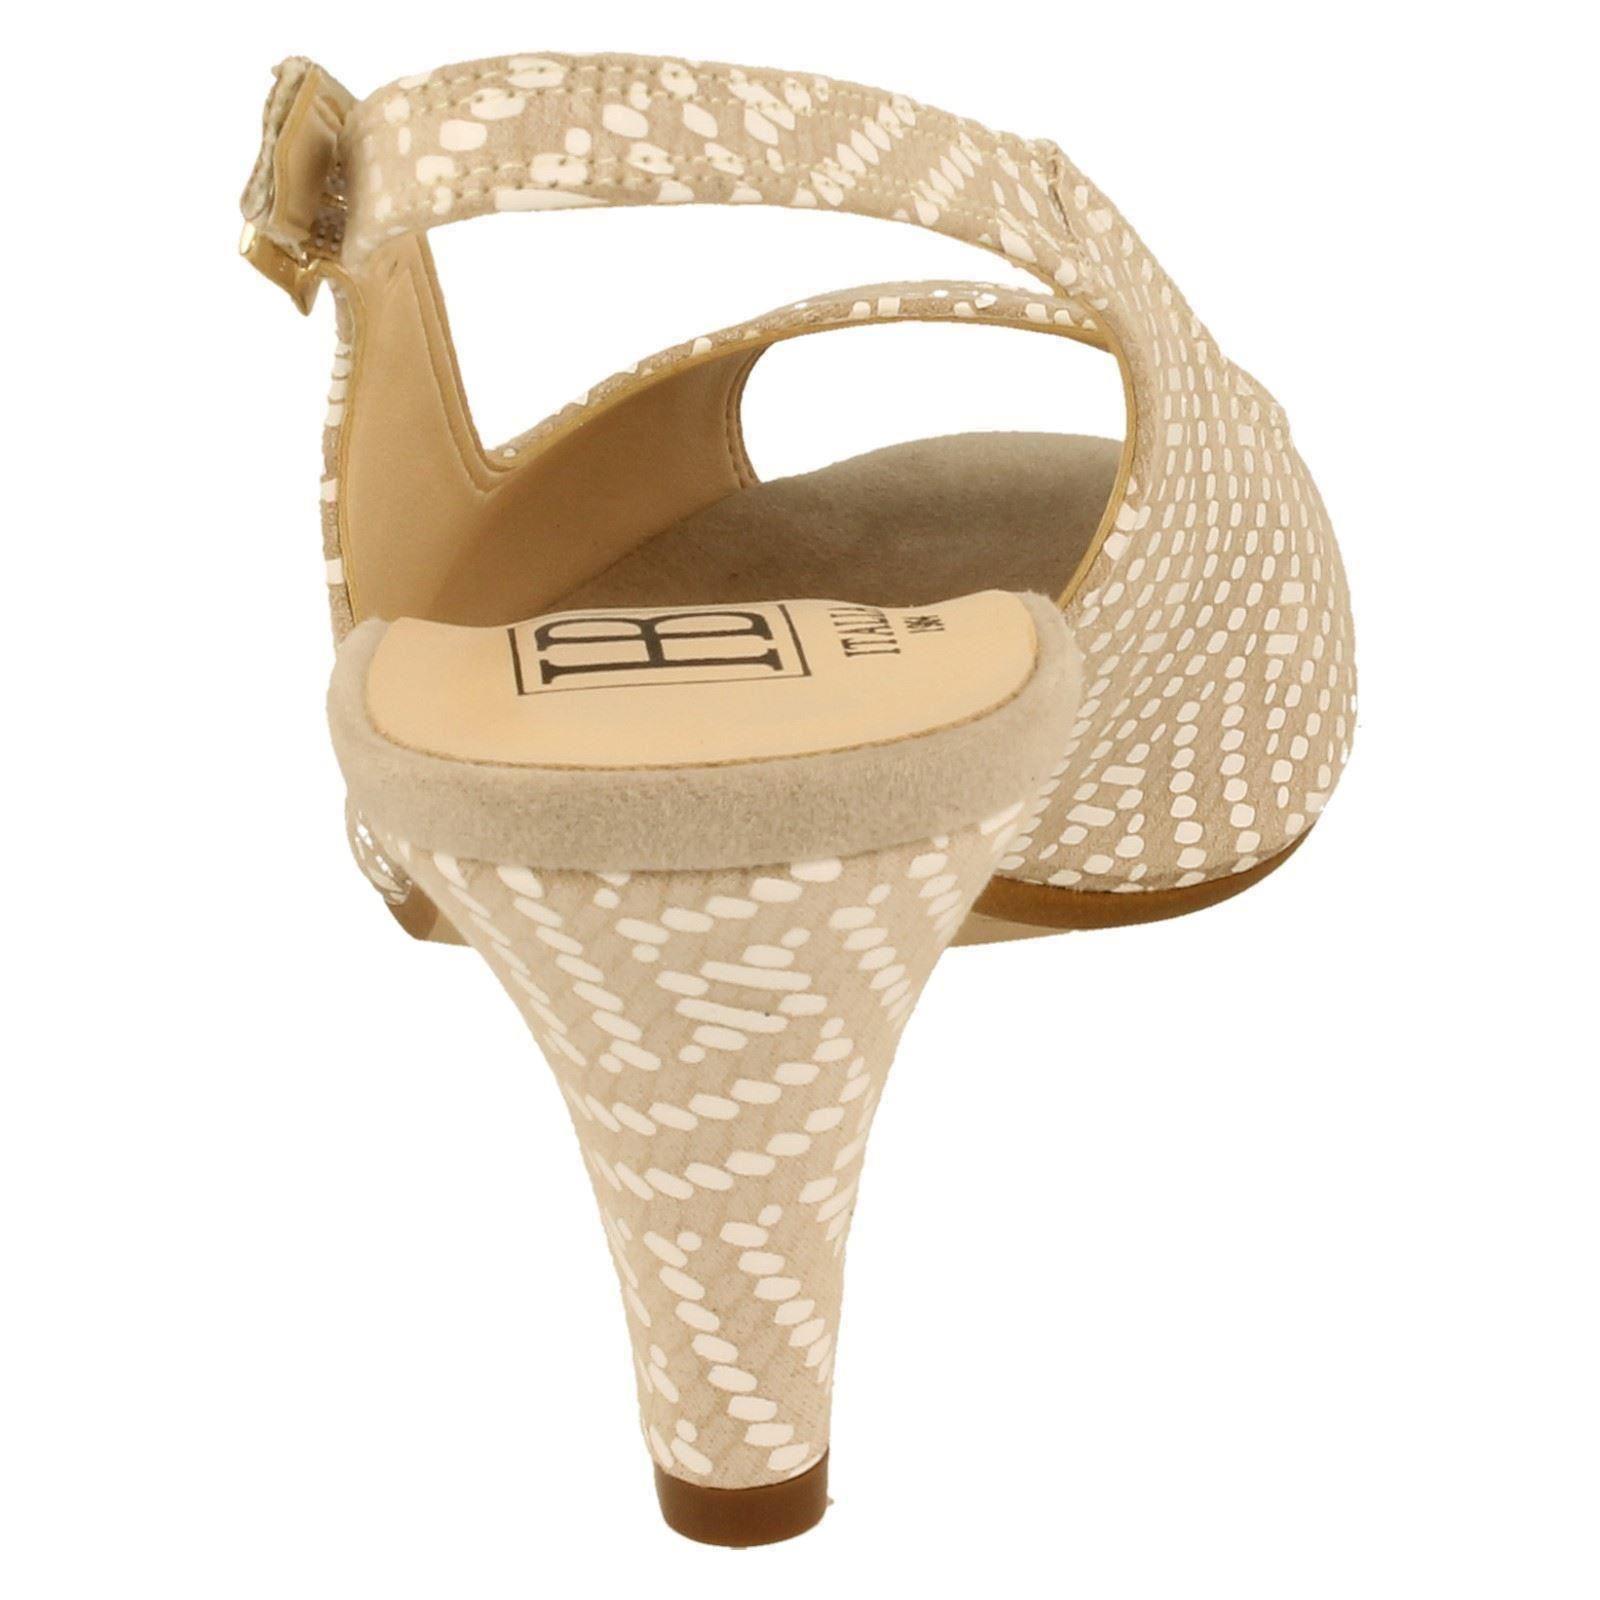 Ladies HB Sling Backs The Style B272-W